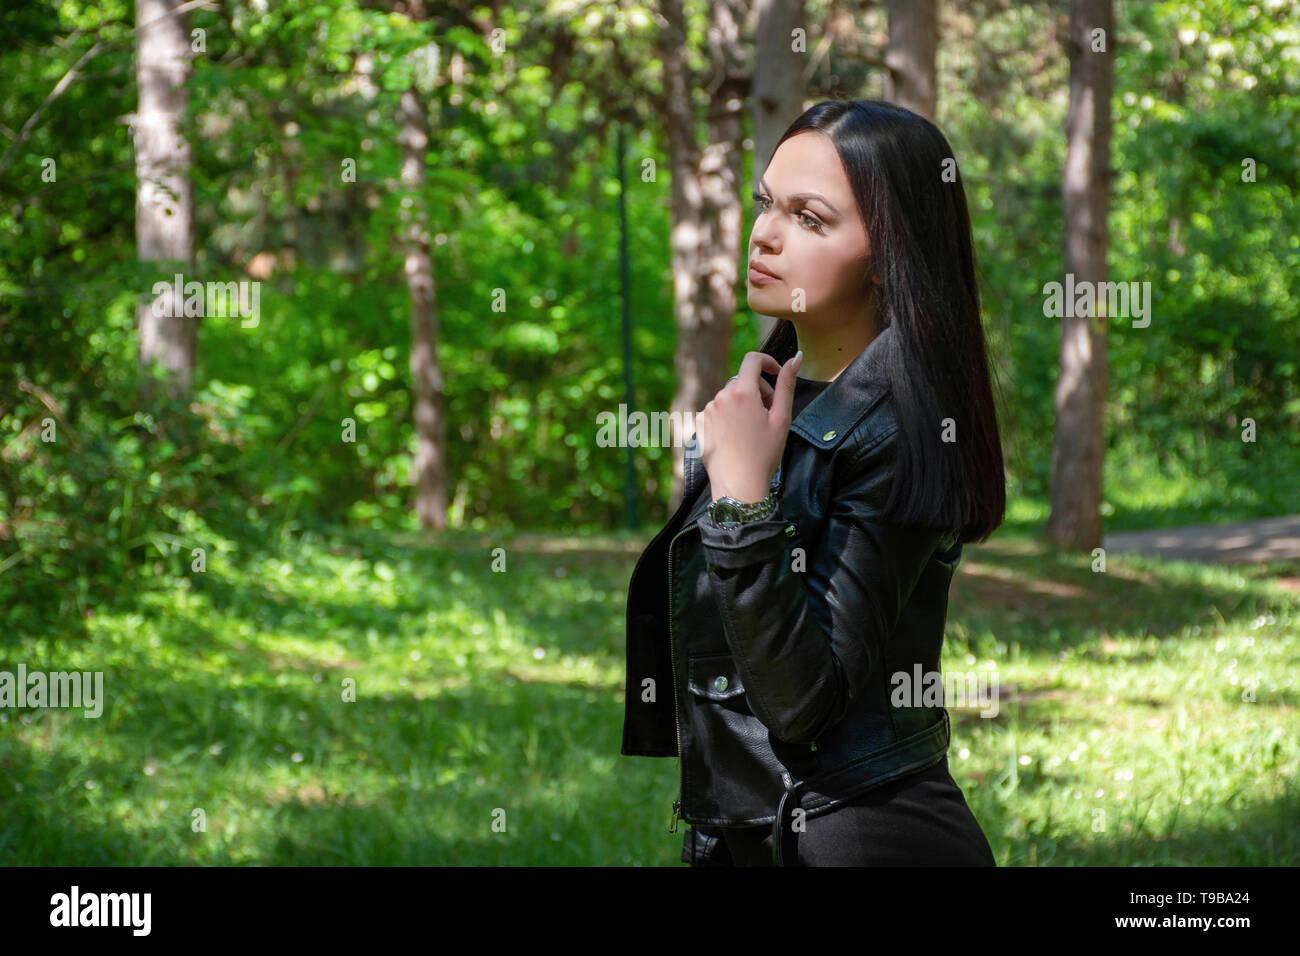 f8114f26a48622 Brunette Model Girl Leather Jacket Photos & Brunette Model Girl ...